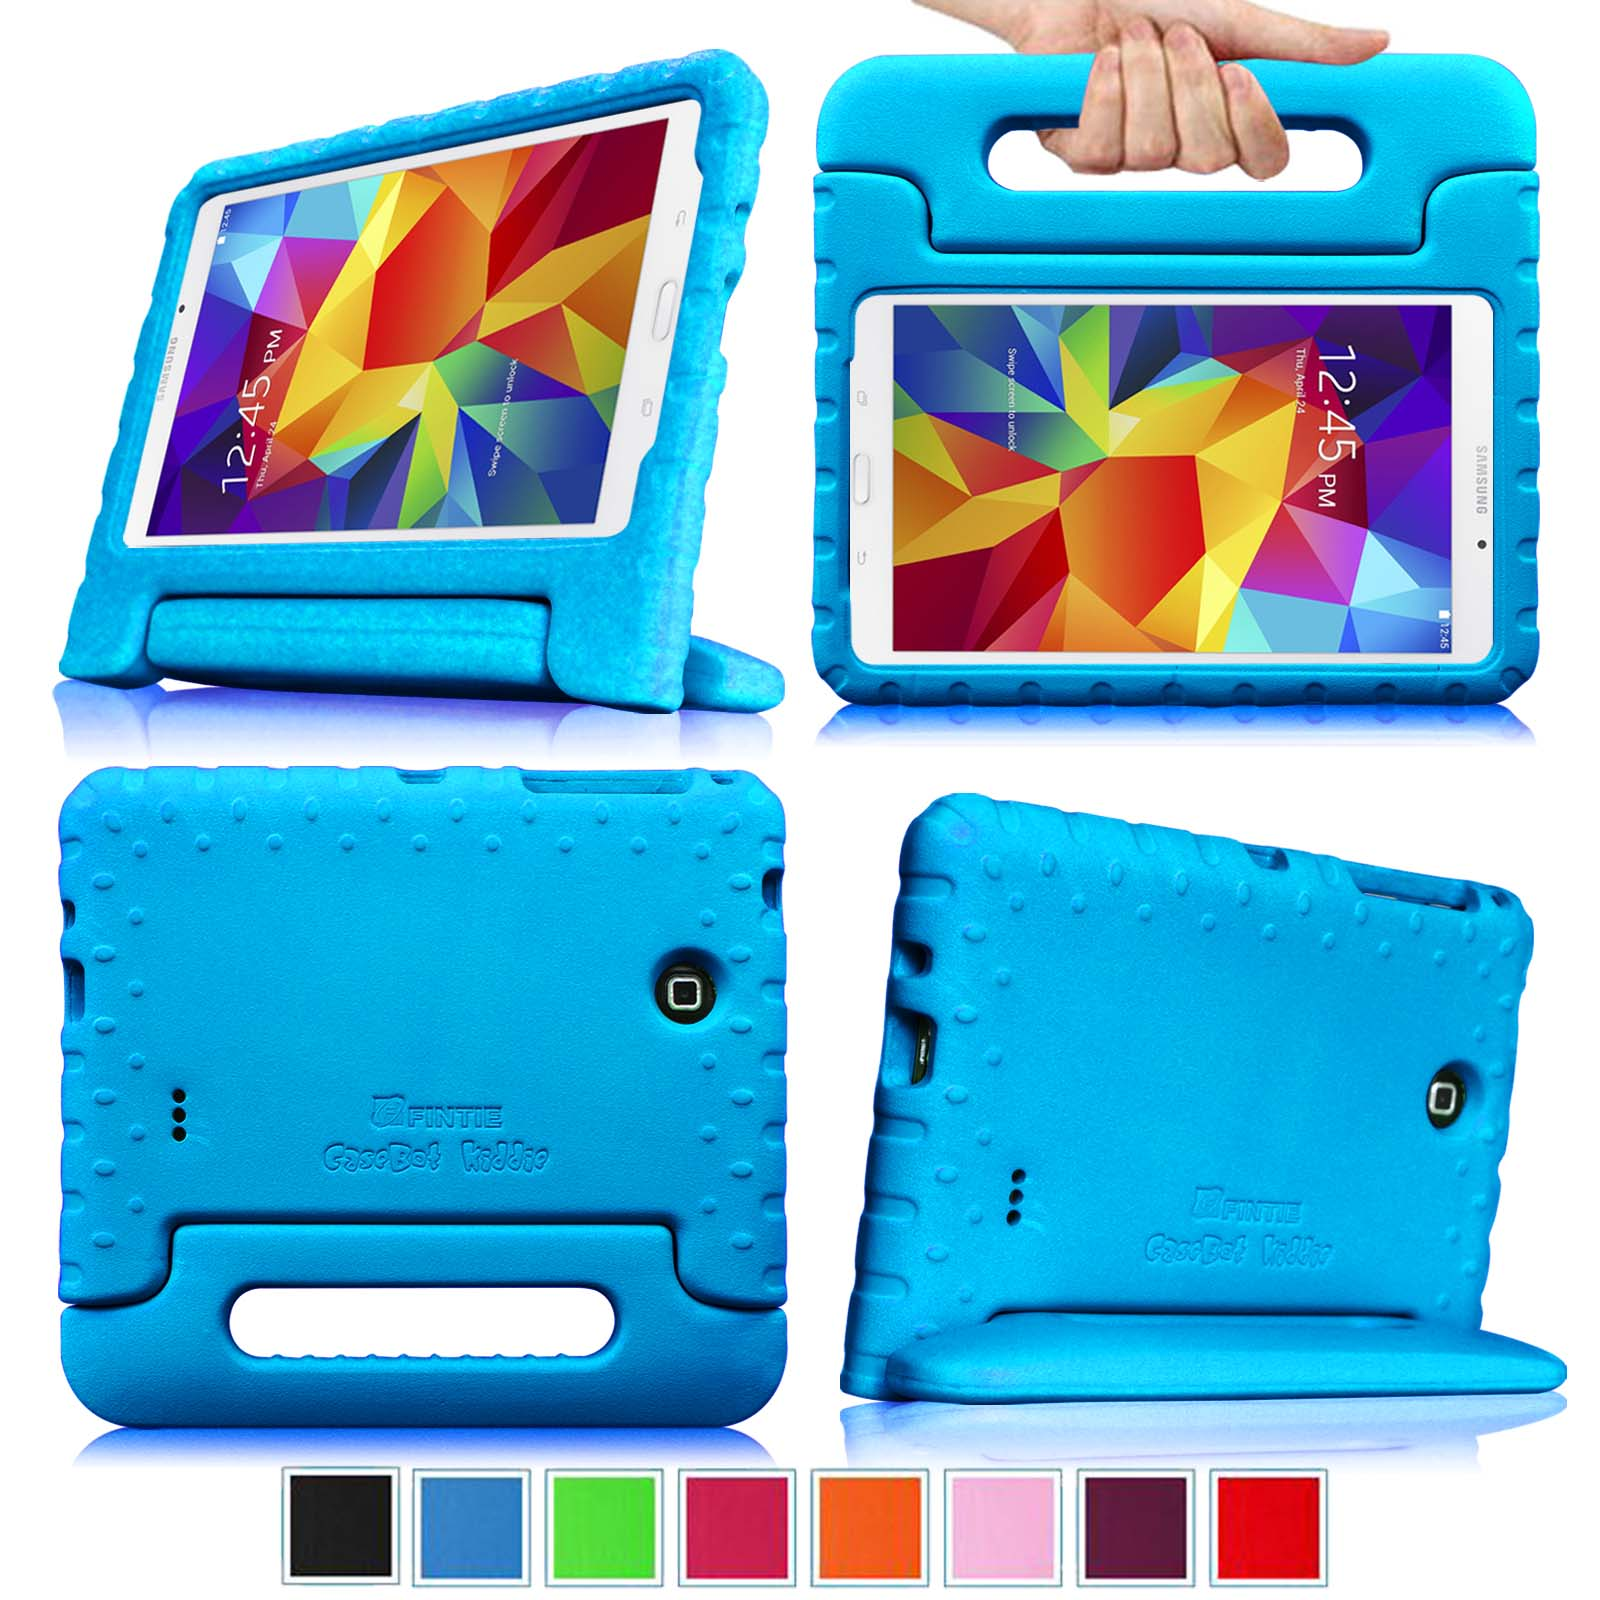 Samsung Galaxy Tab 4 7.0 Inch Kiddie Case - Fintie  Lightweight Shock Proof Convertible Handle Stand Kids Friendly, Blue